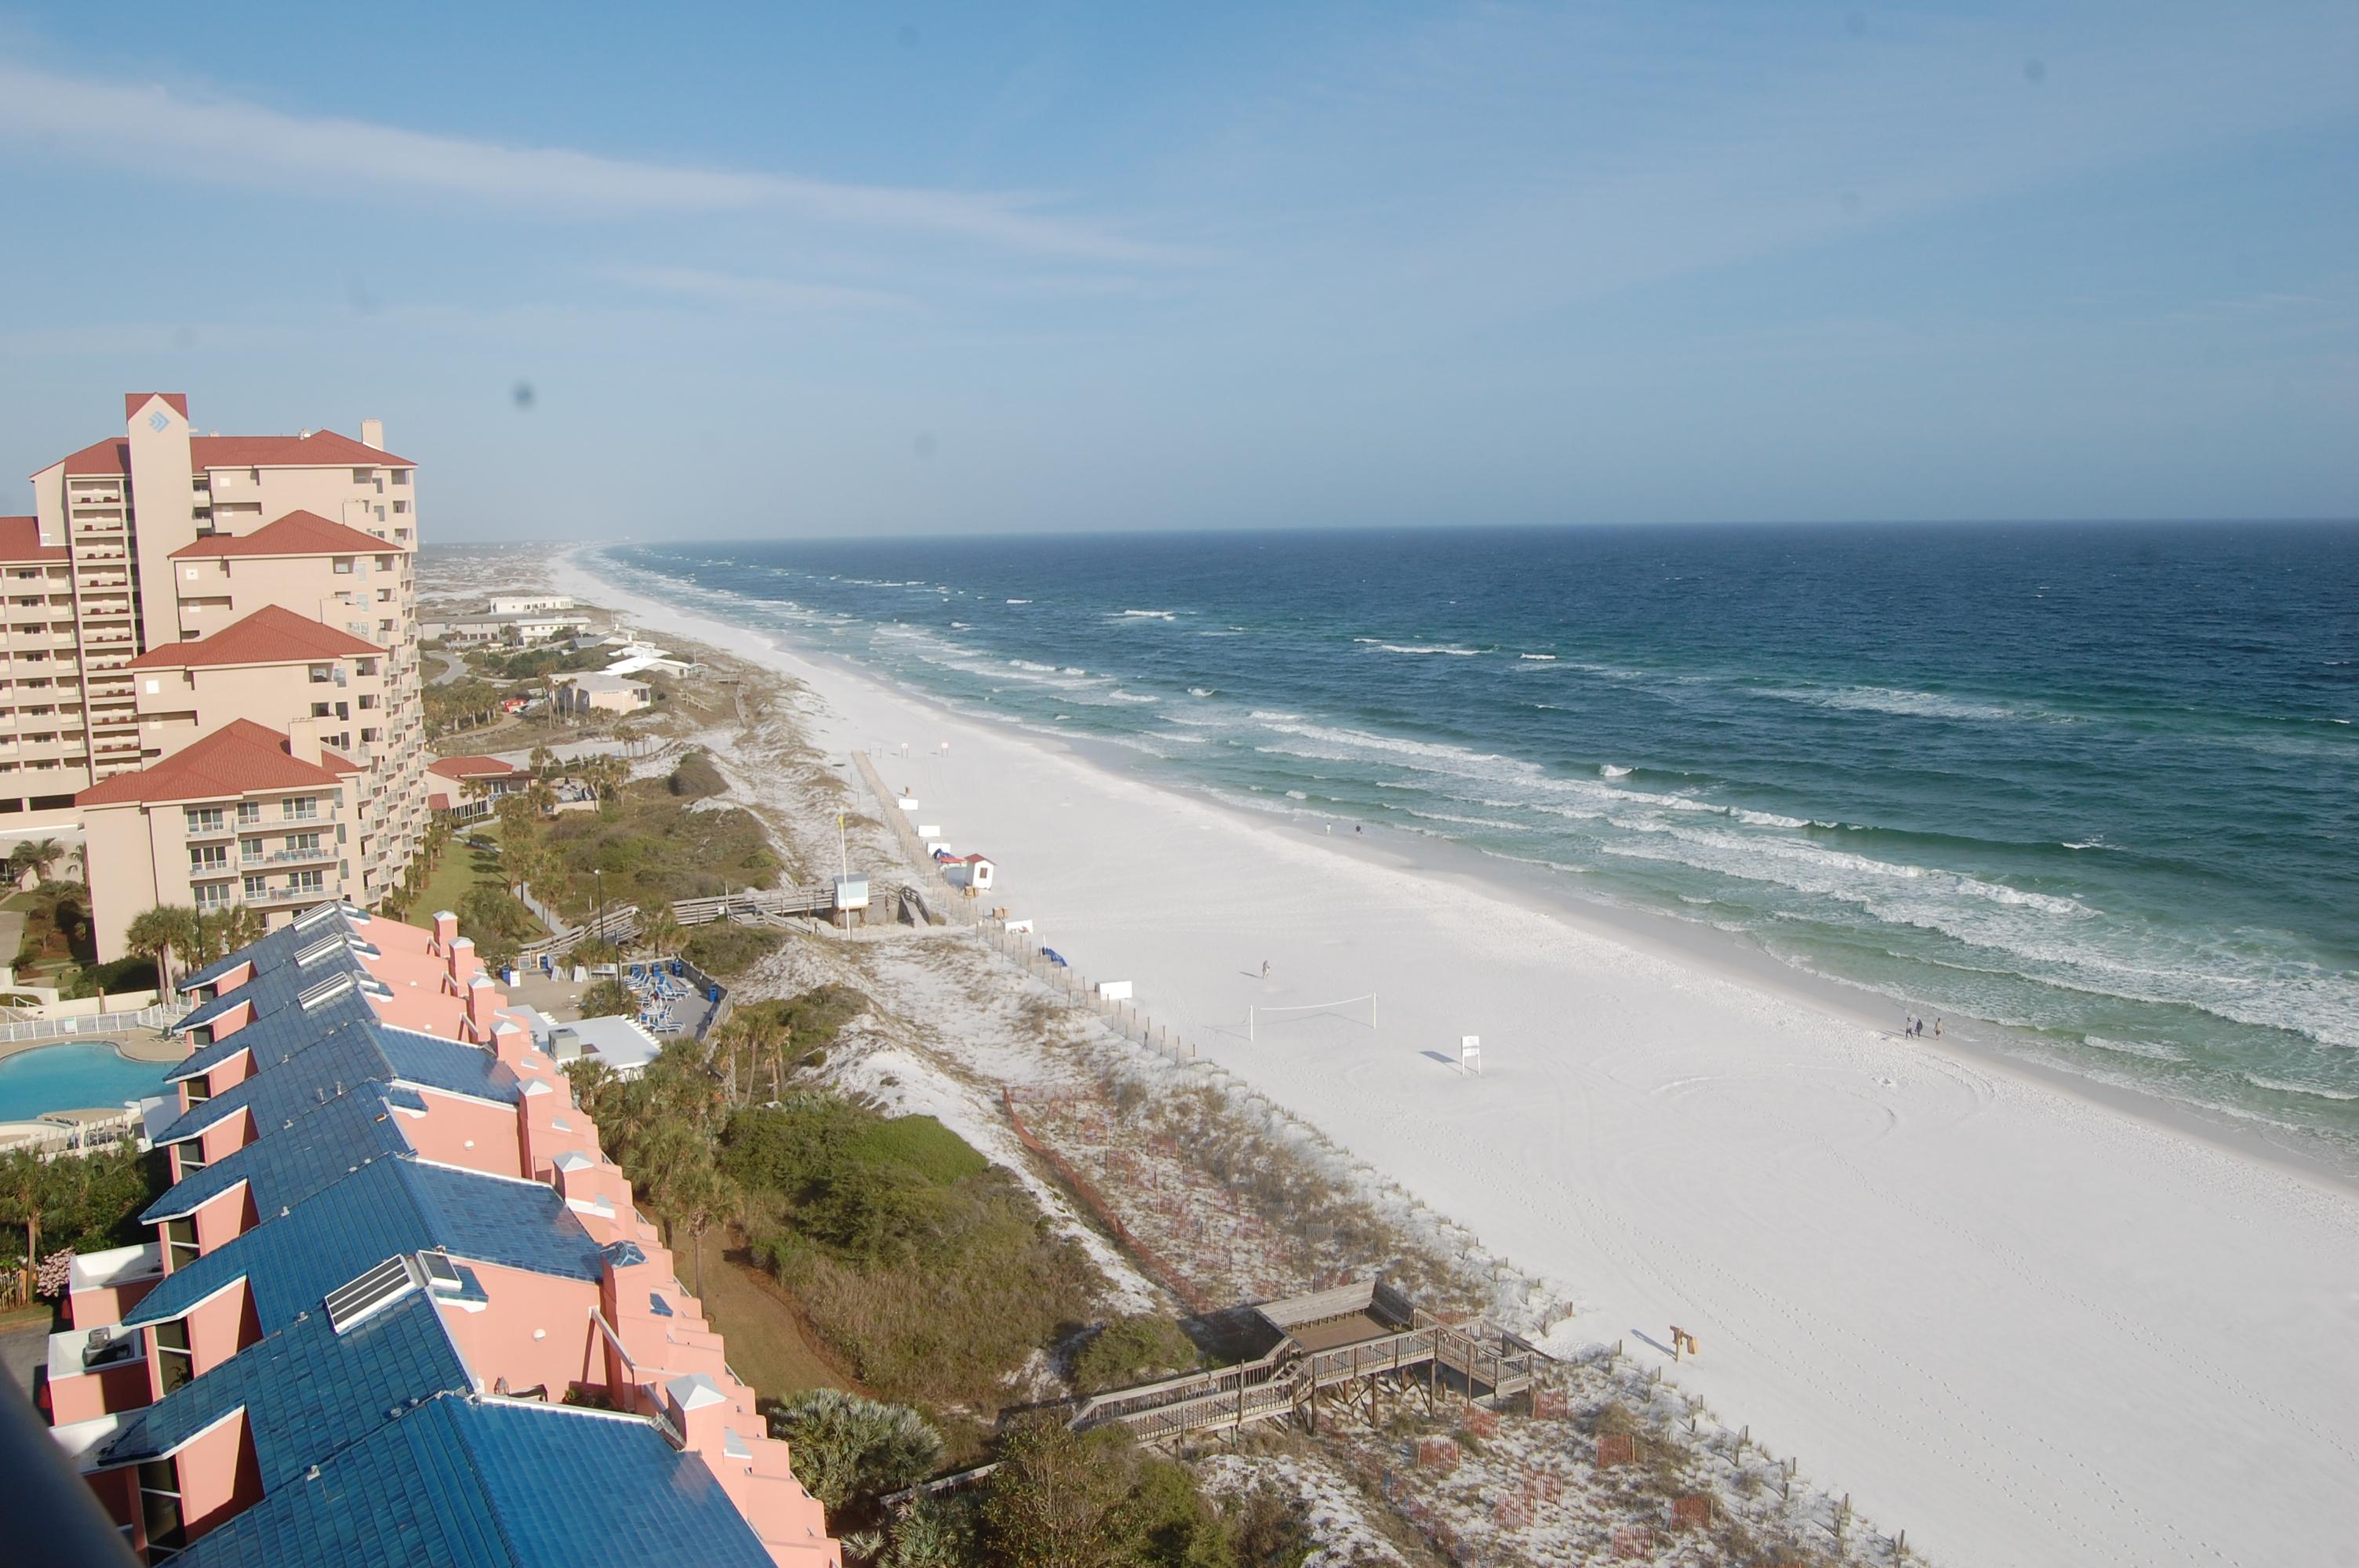 Beach Towers in Sandestin Florida